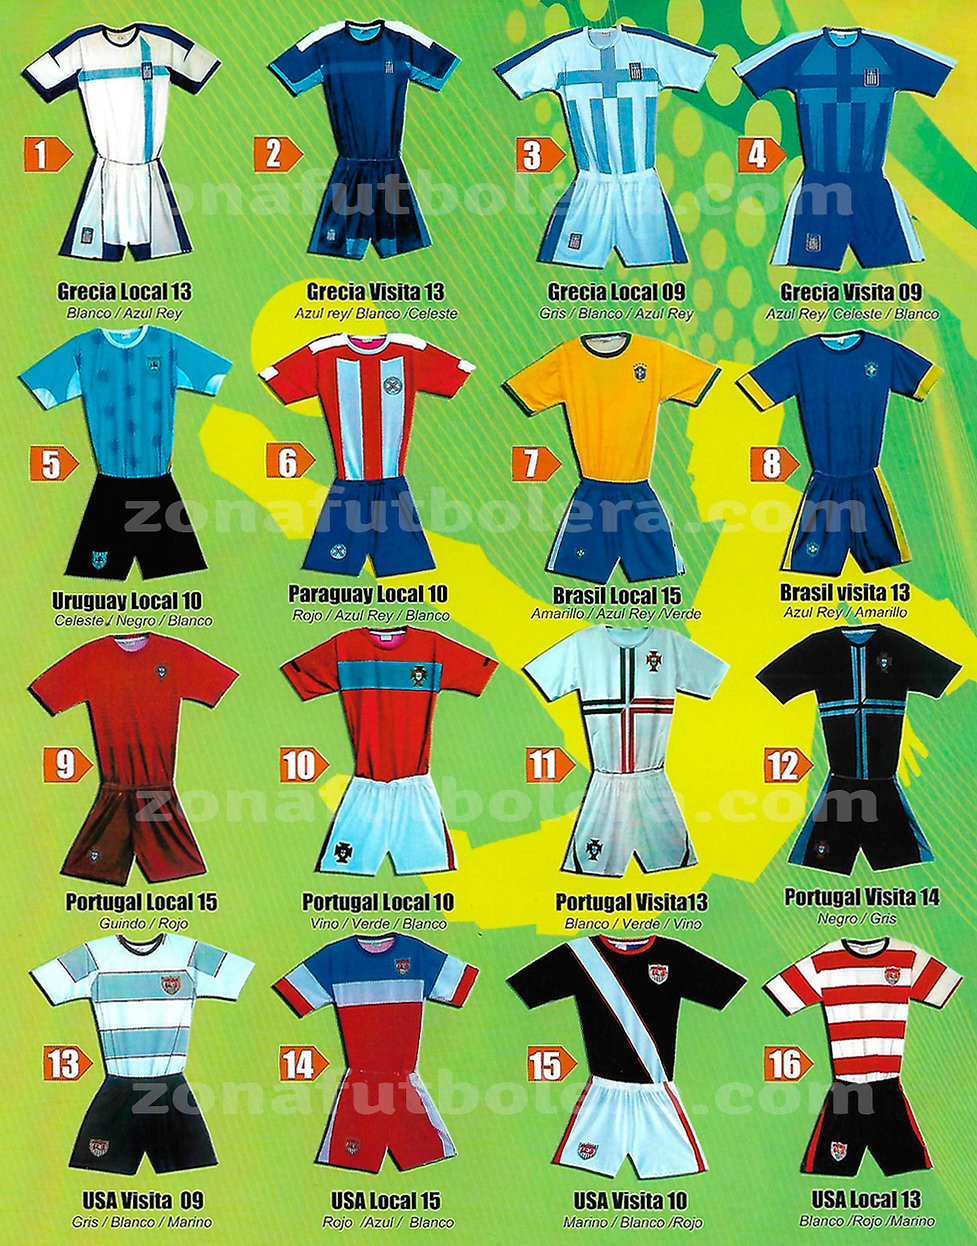 Catalogo Uniformes de Futbol